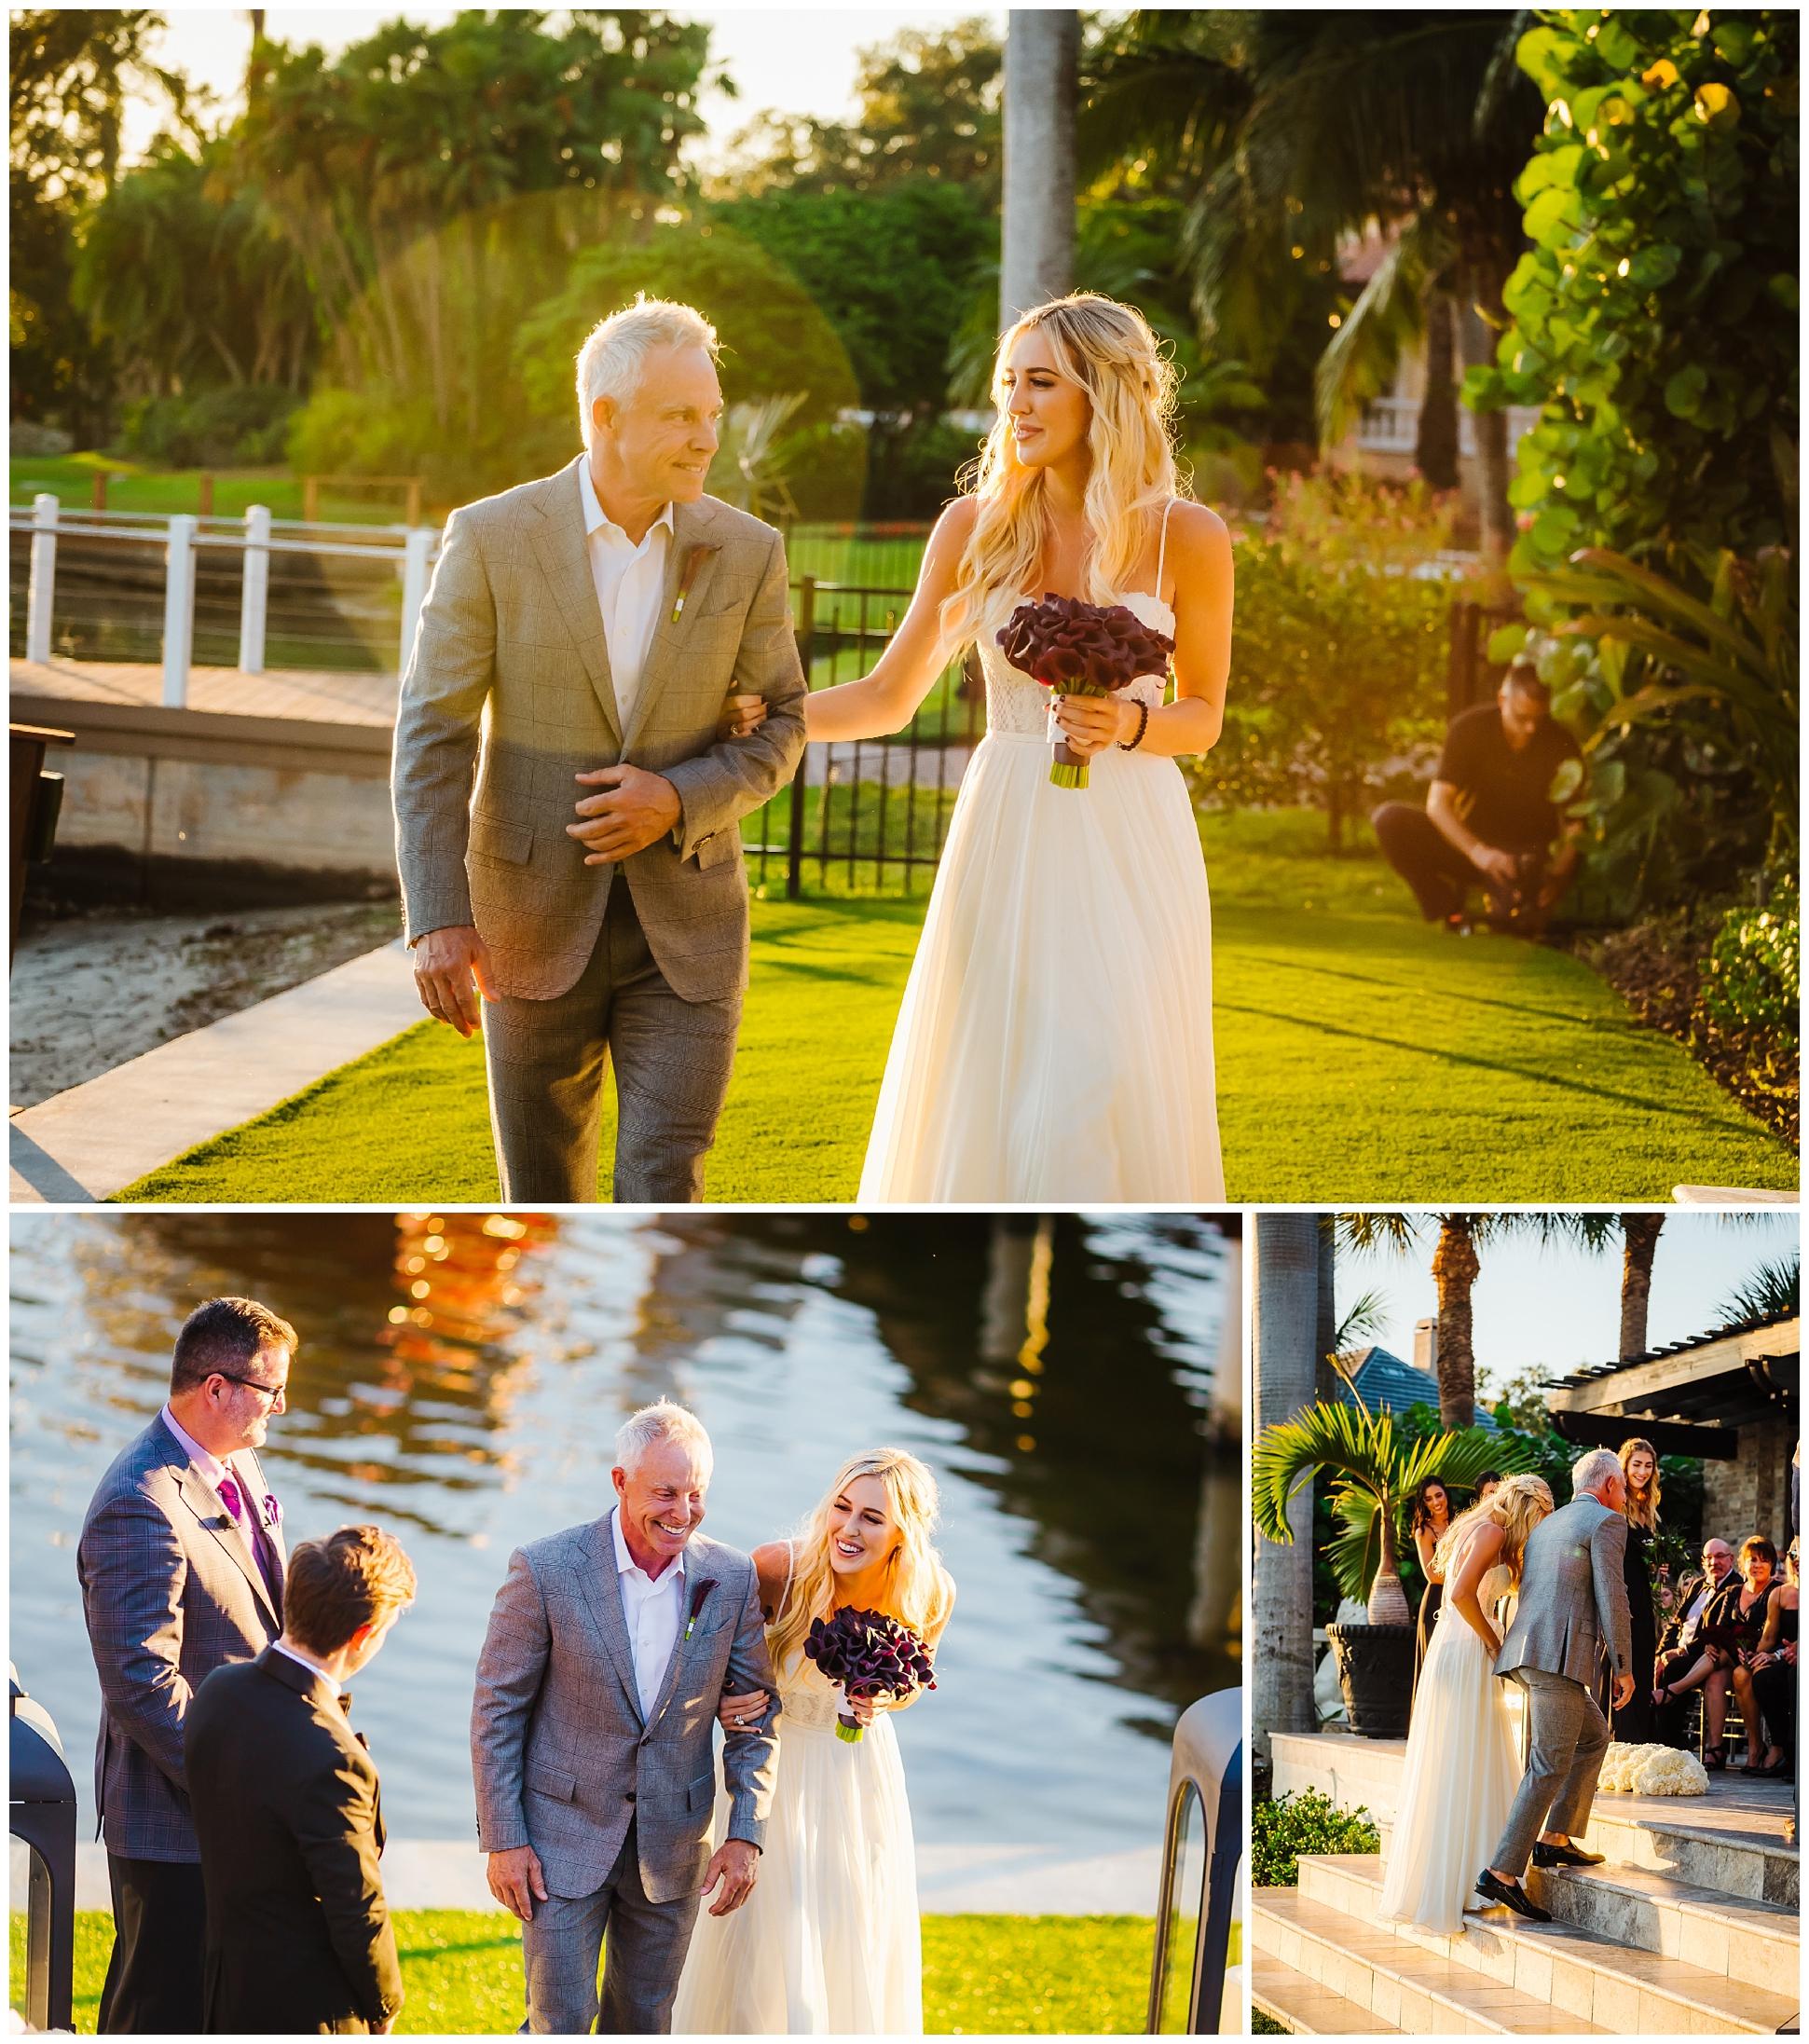 st-pete-wedding-photographer-backyard-luxury-snell-isle-vinoy_0037.jpg